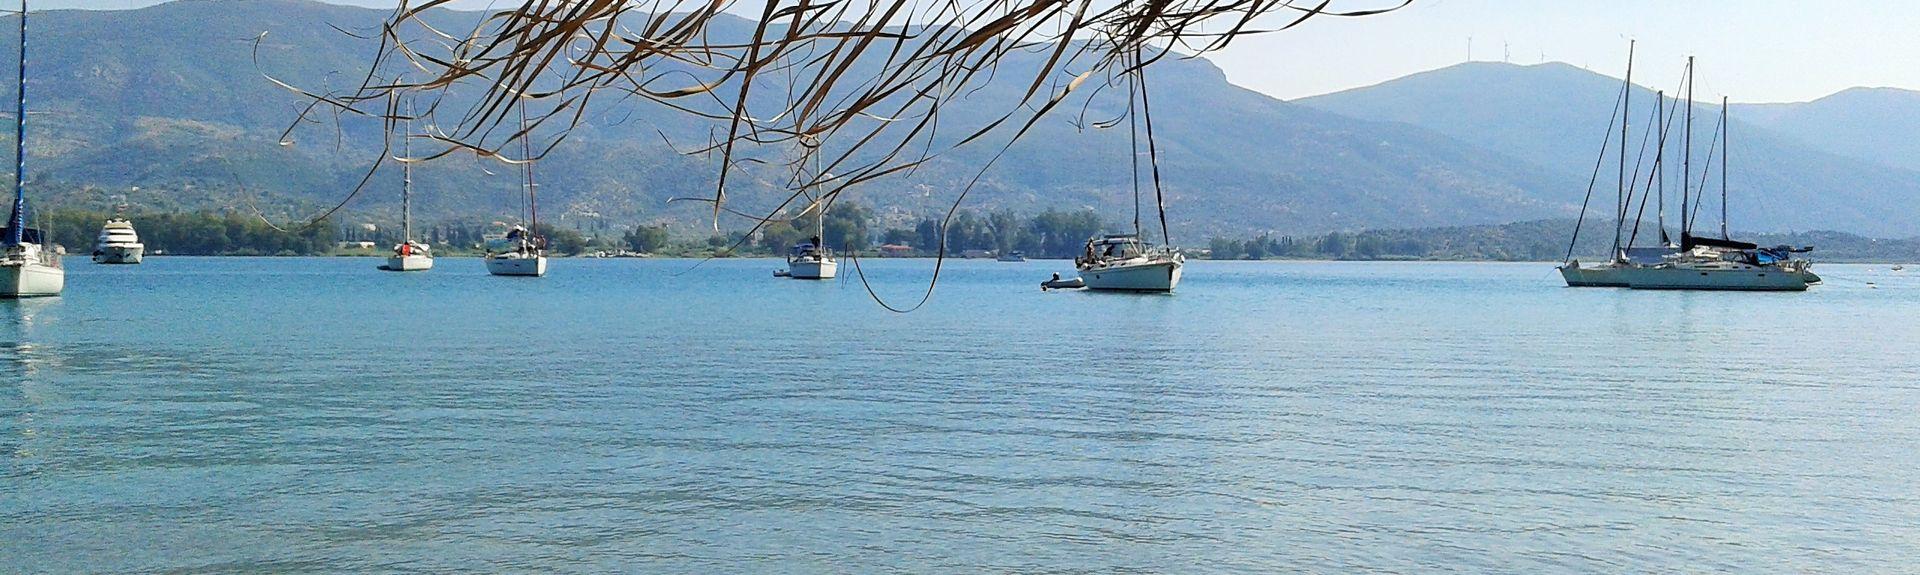 Methana, Greece